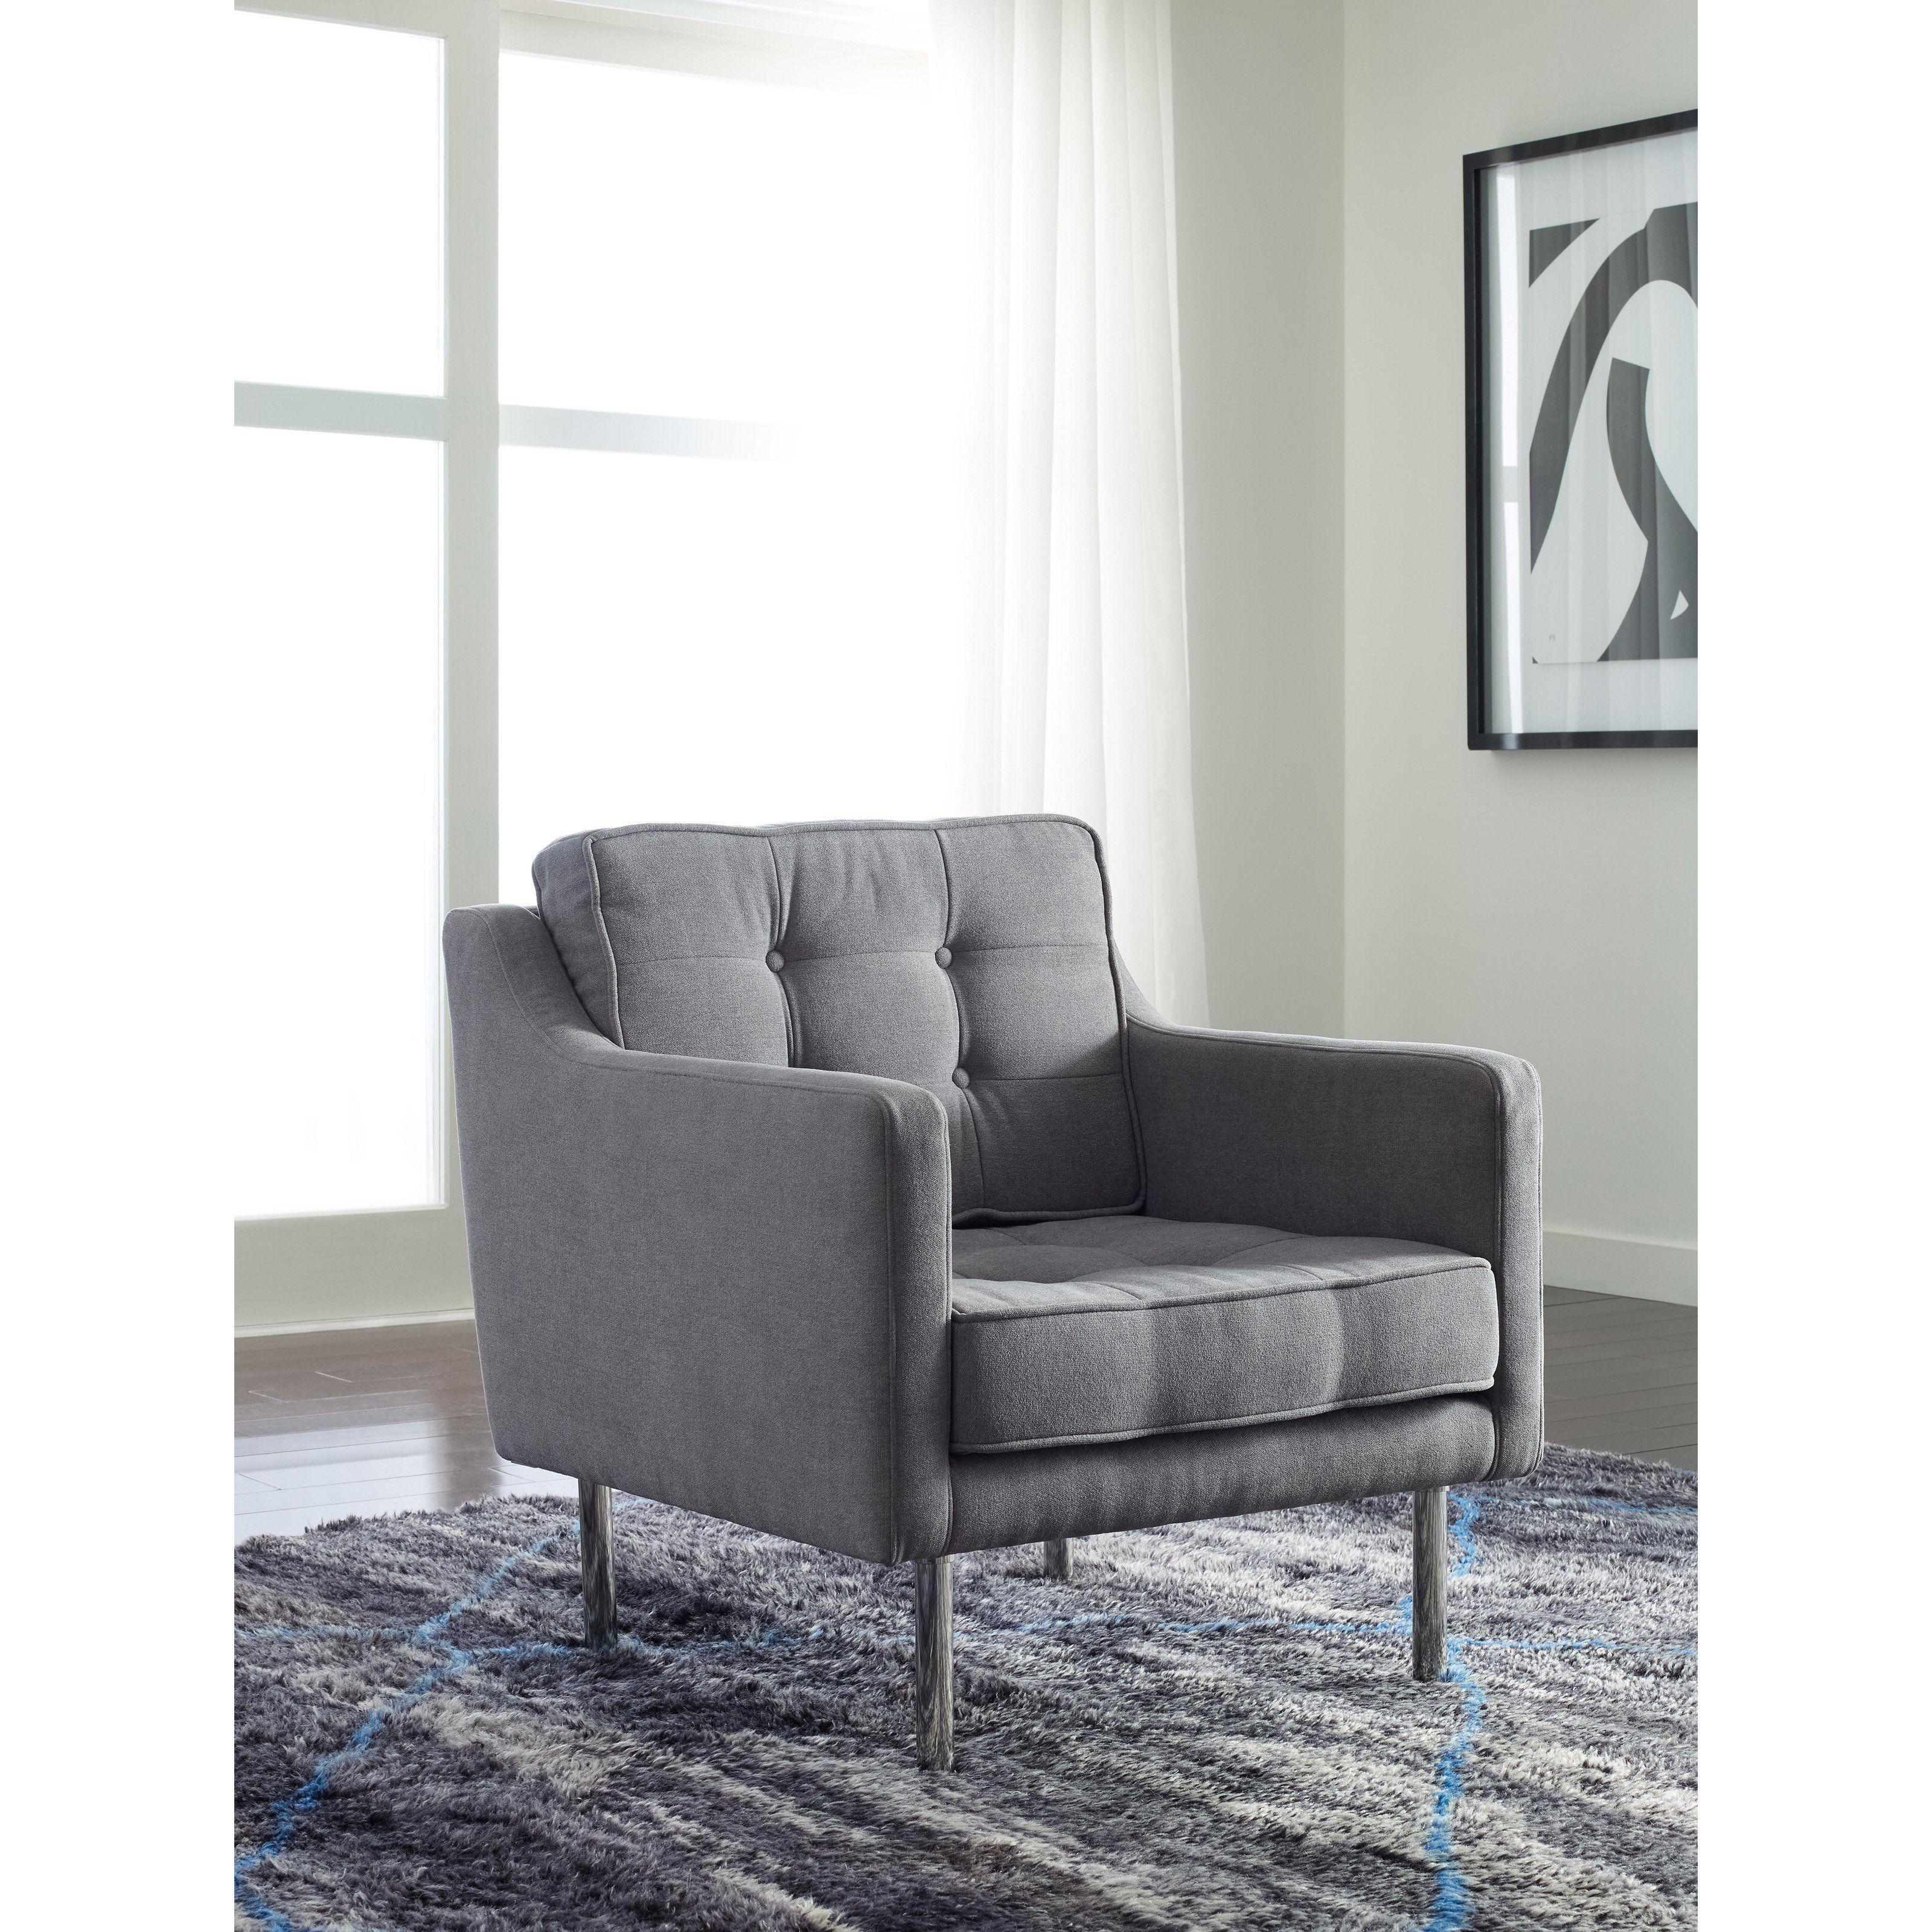 Sensational Tommy Hilfiger The Sylvia Upholstered Chair With Chrome Legs Short Links Chair Design For Home Short Linksinfo